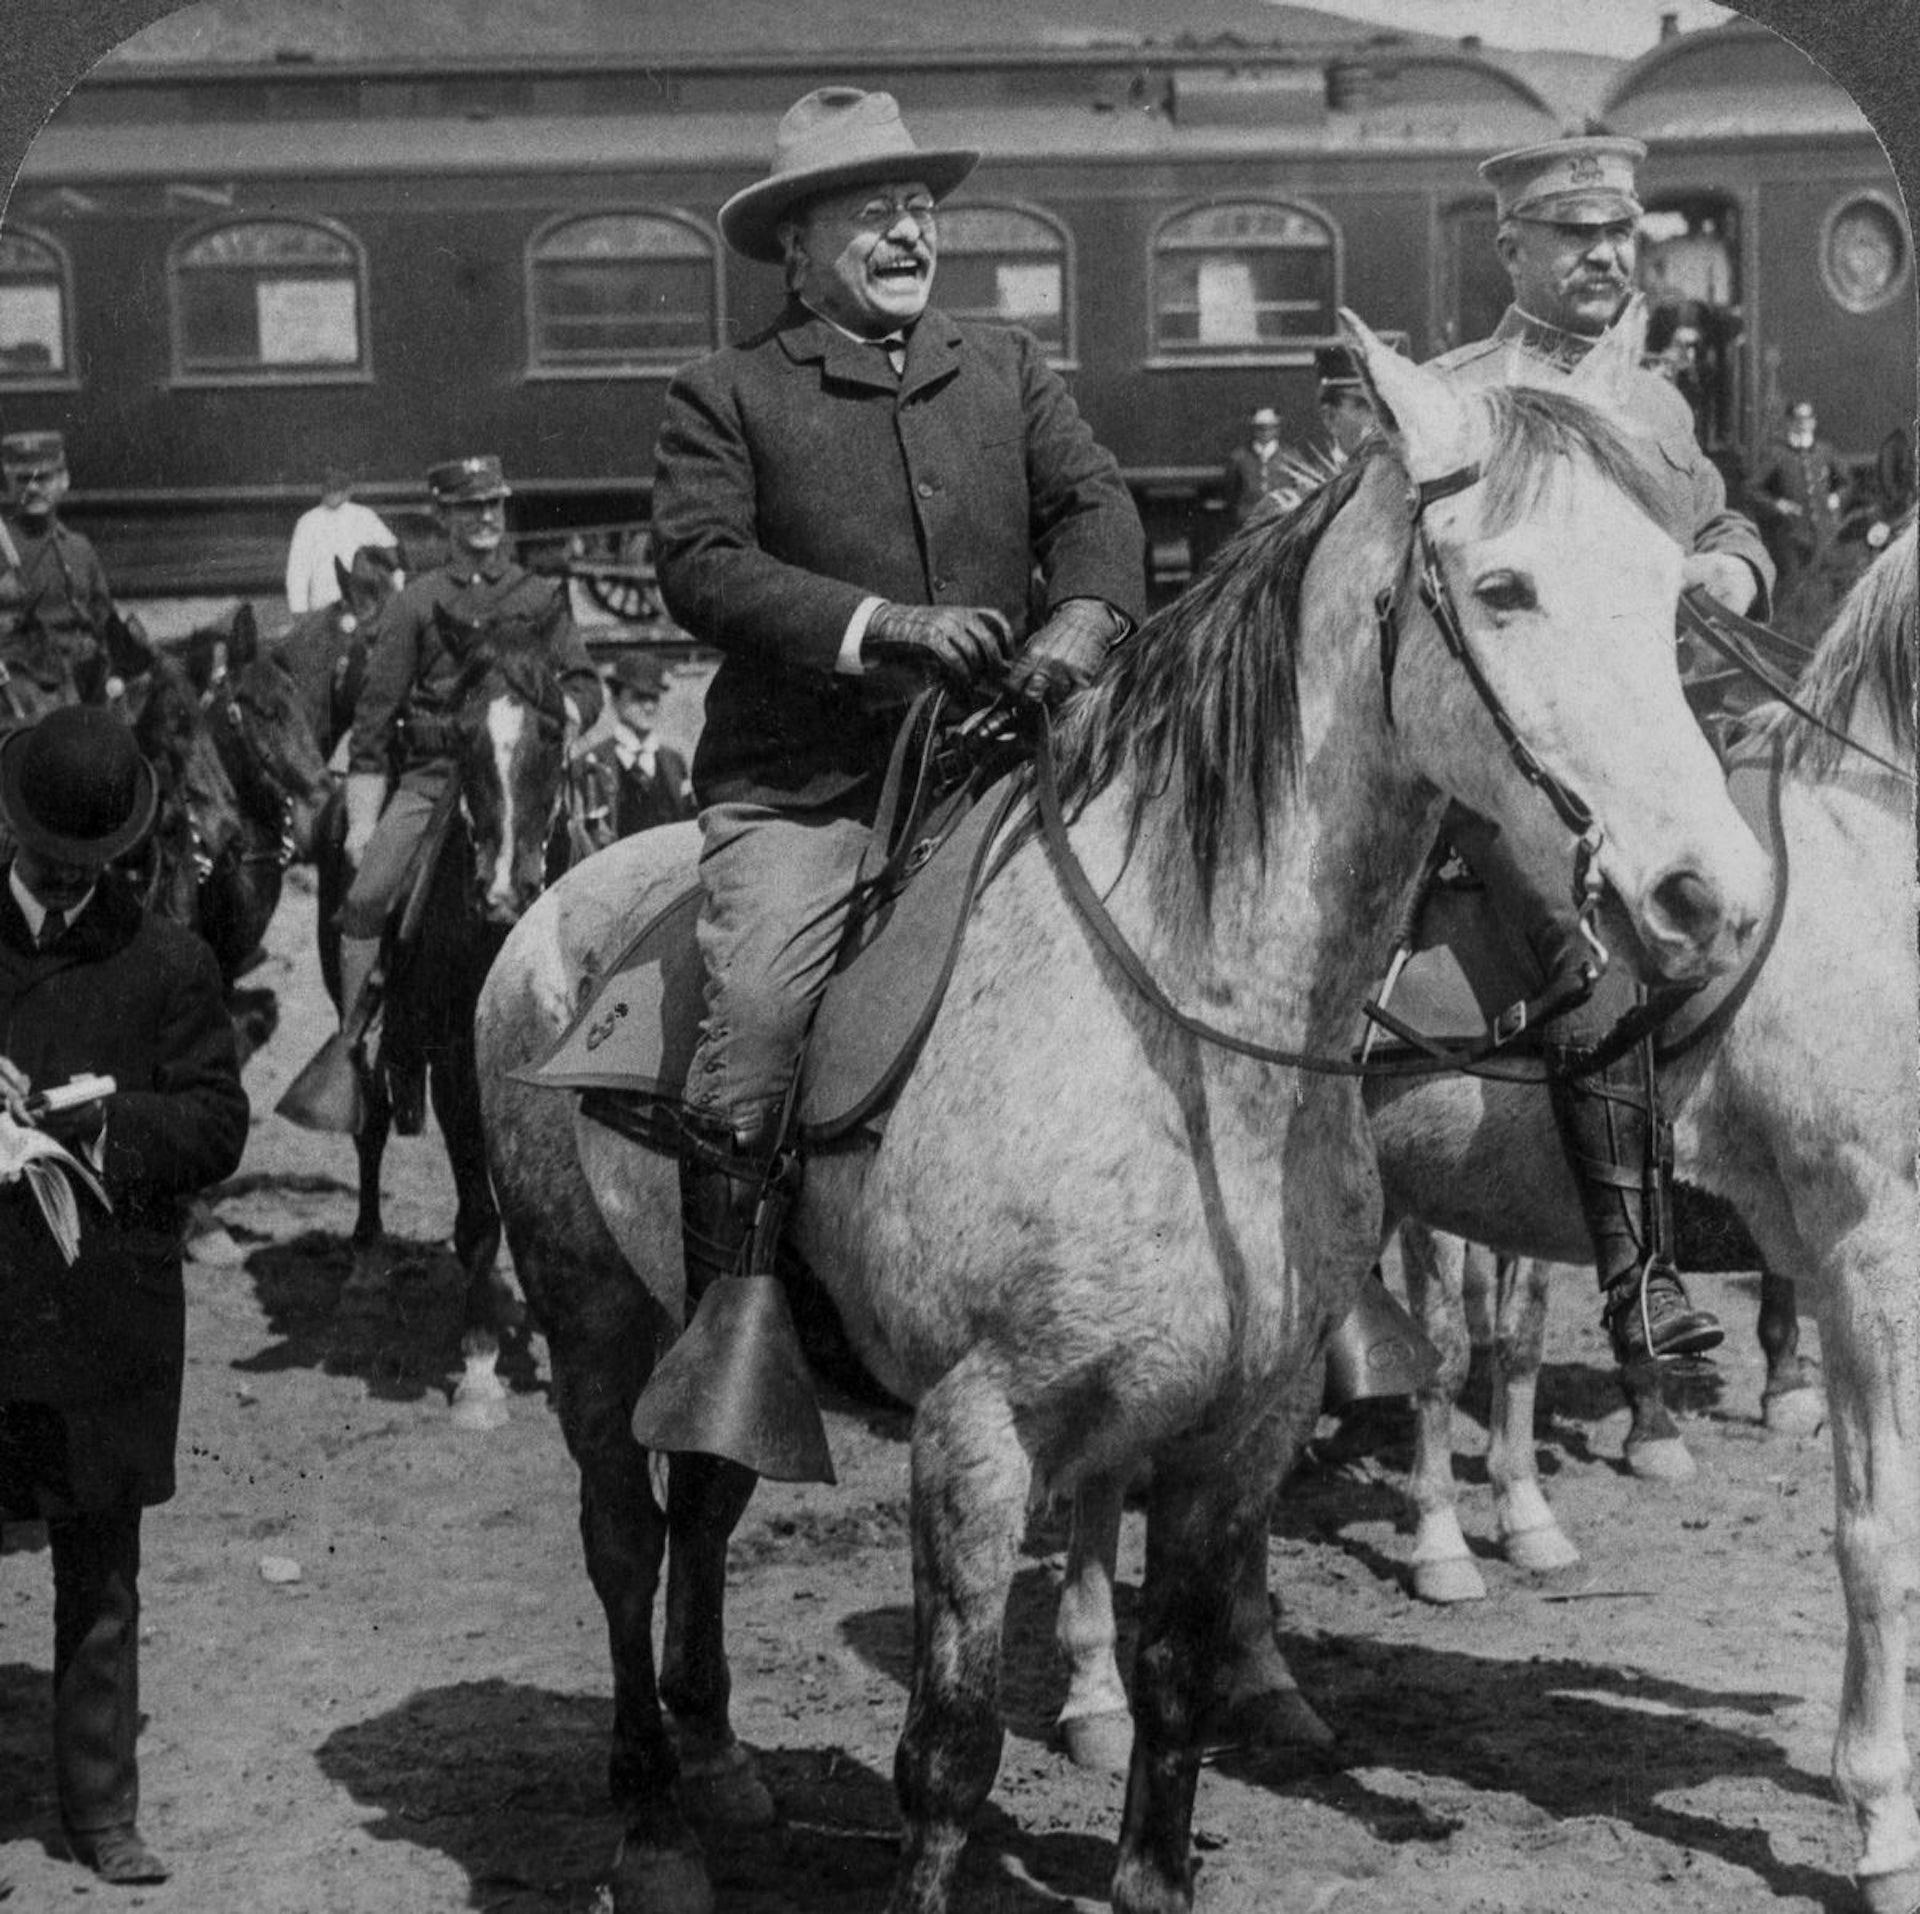 Roosevelt on horseback looking elated.